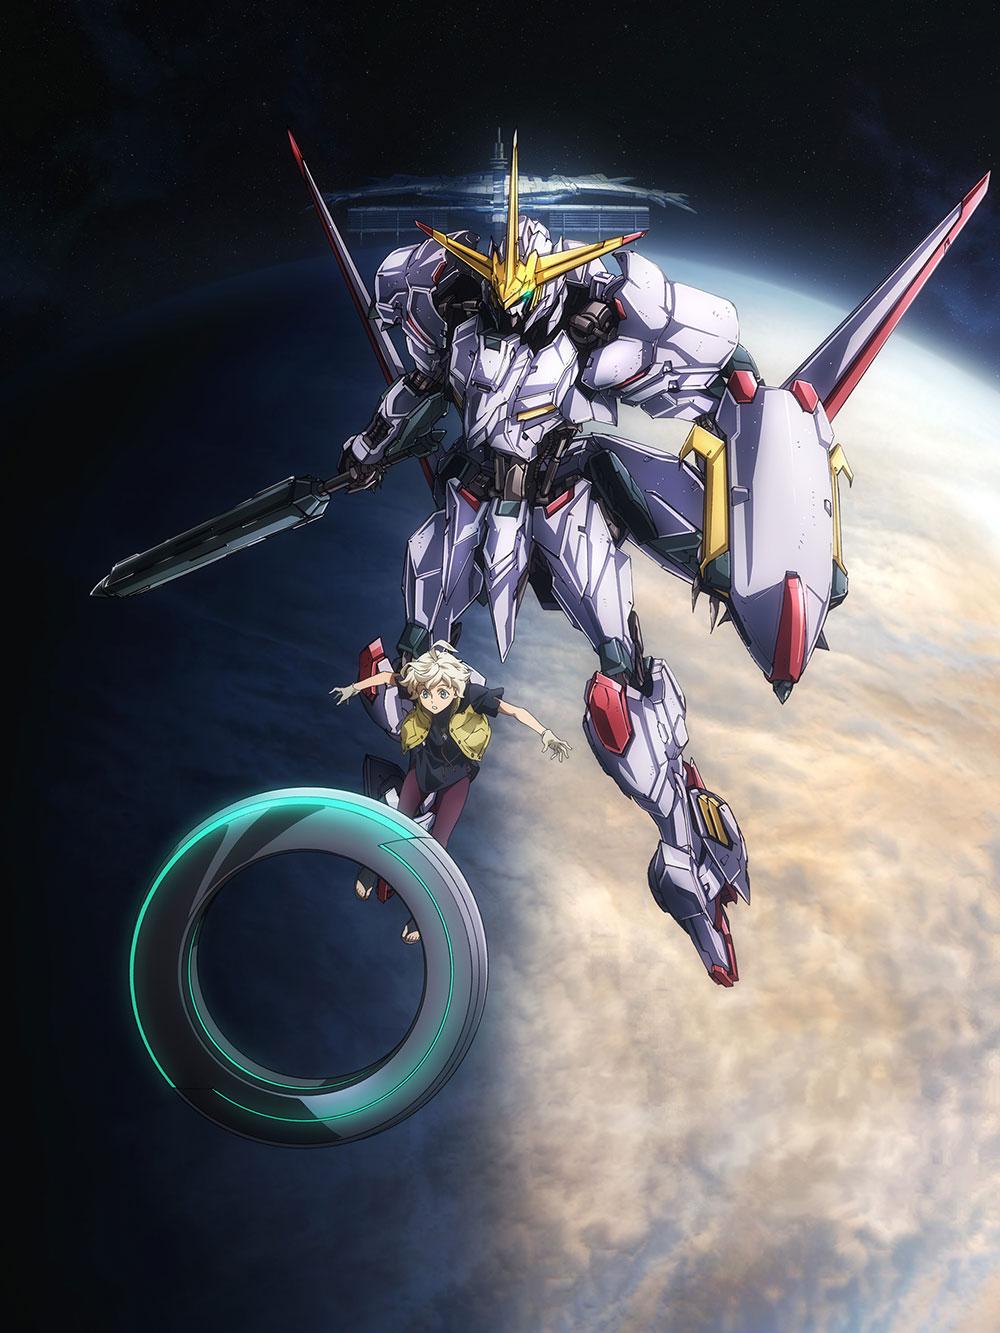 Gundam Iron Blooded Orphans 2812019 2